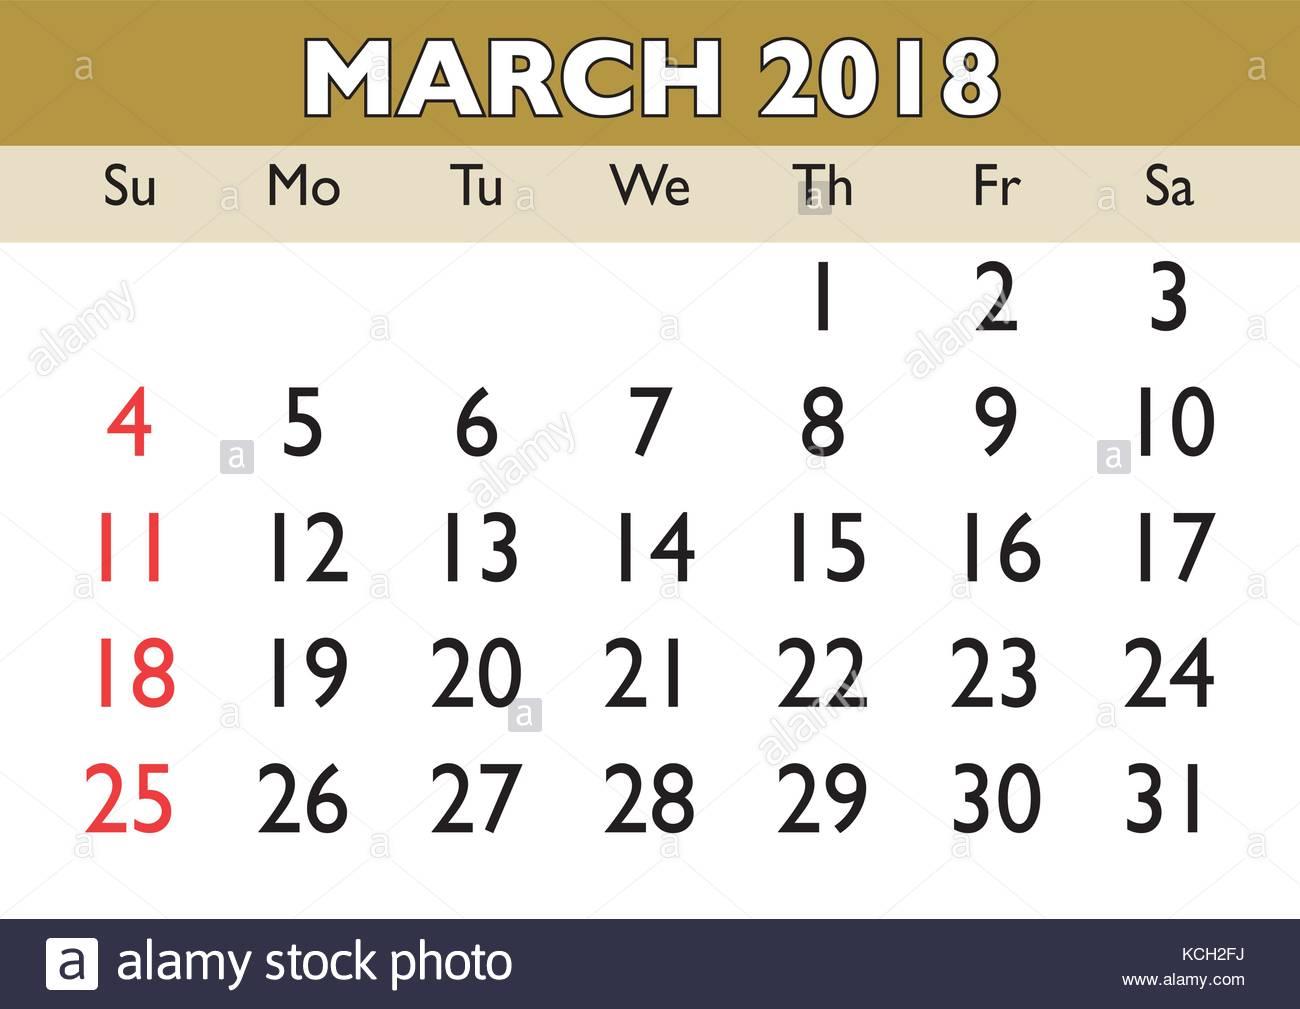 2018 calendar march month vector printable calendar monthly scheduler week starts on sunday english calendar